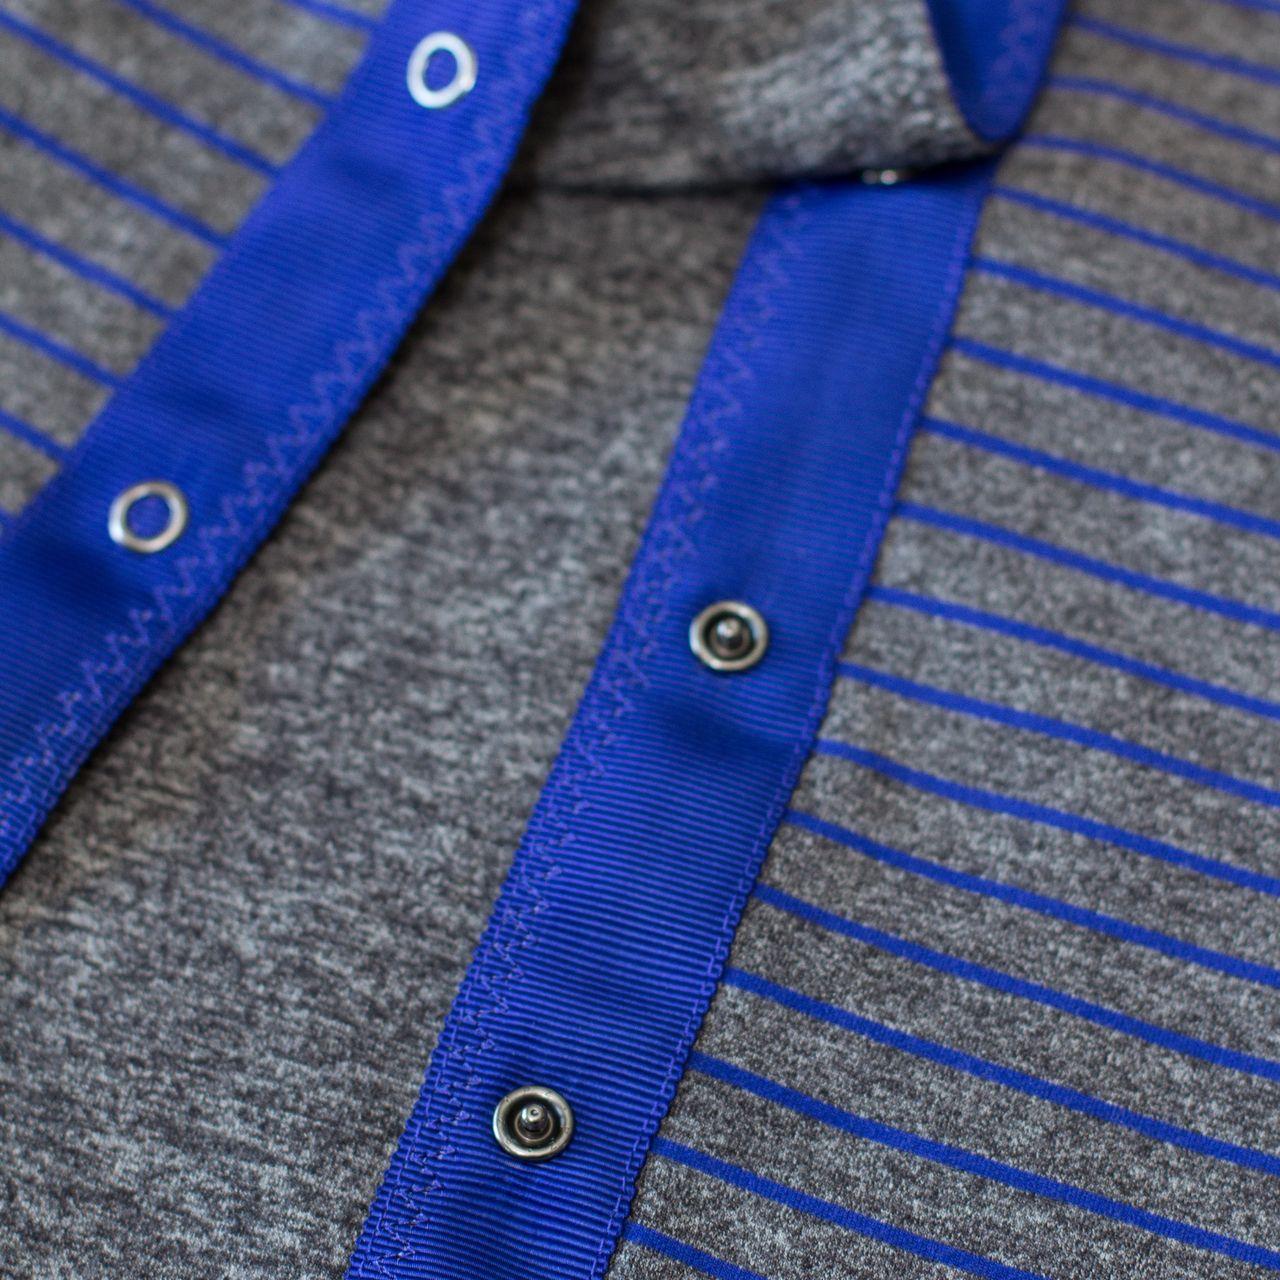 Lululemon Vinyasa Scarf *Rulu - Parallel Stripe Pigment Blue Heathered Black / Heathered Black